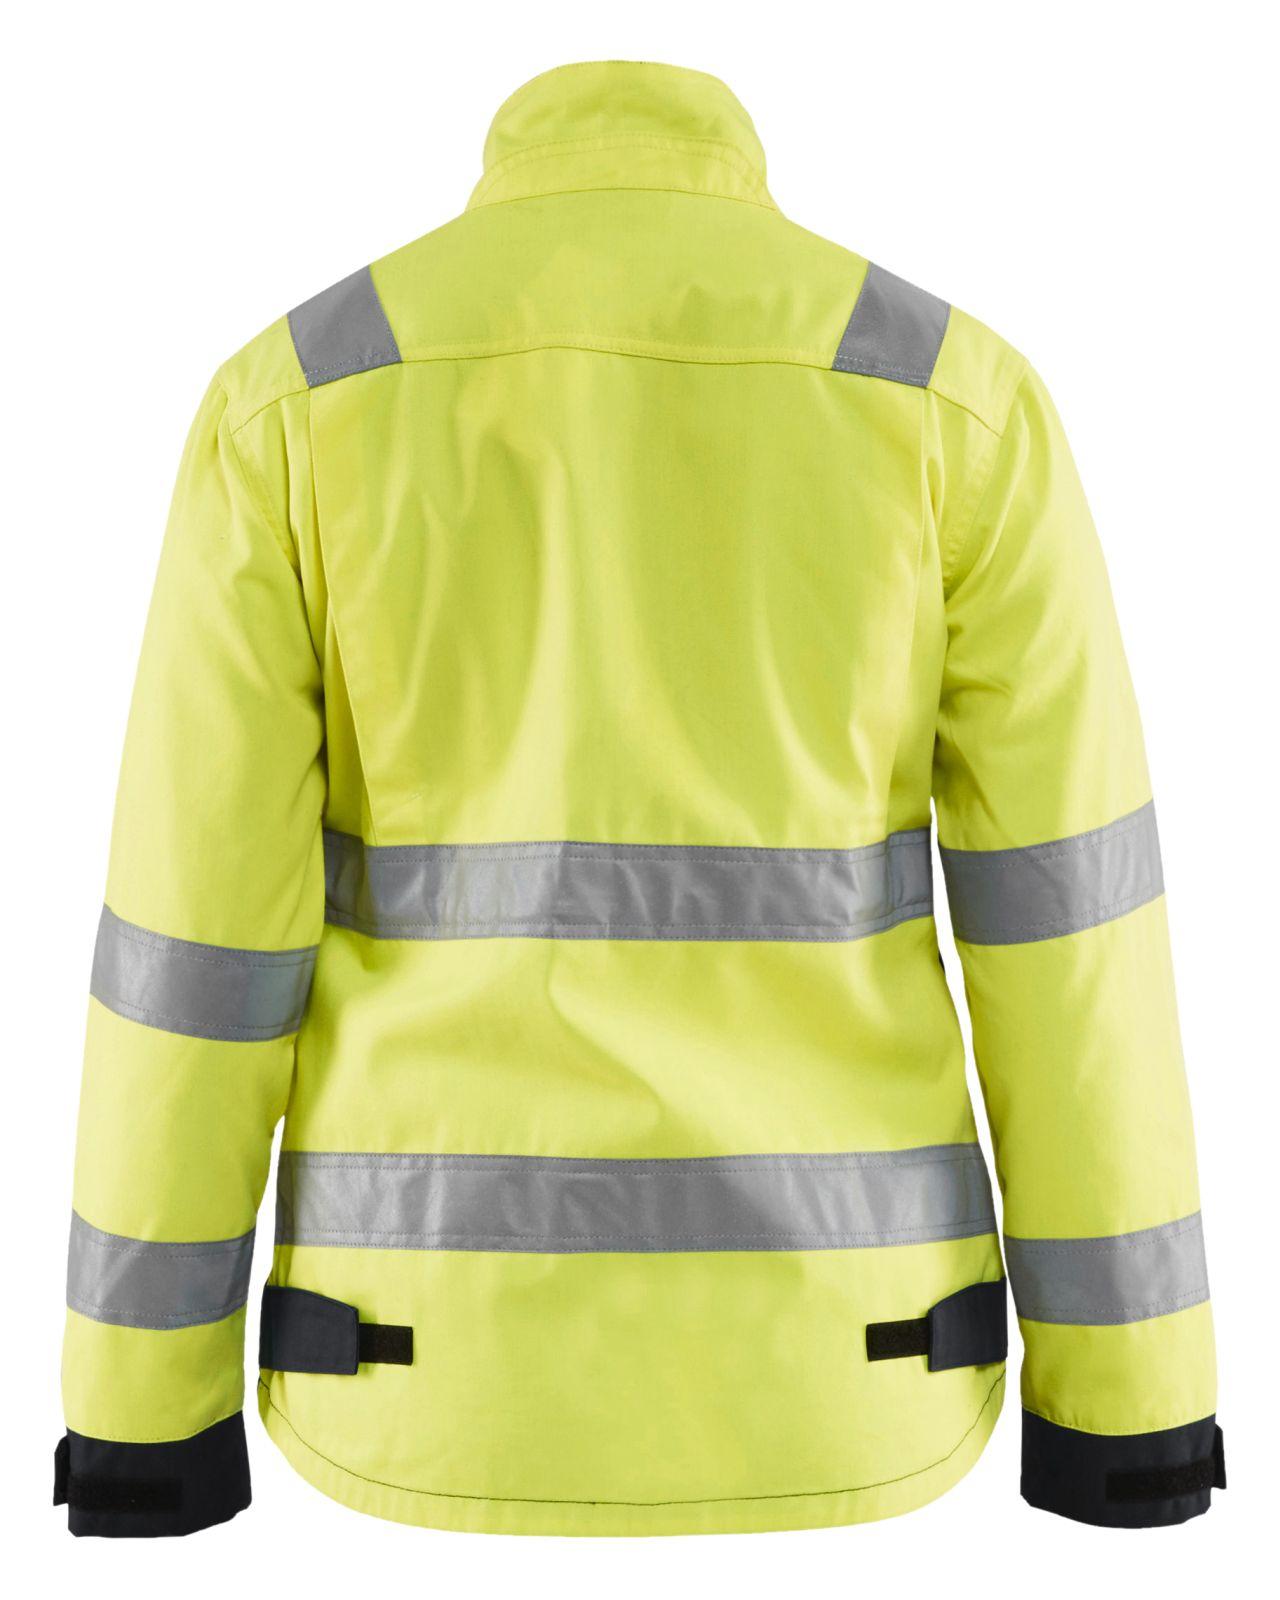 Blaklader Dames werkjacks 49031811 High Vis geel-zwart(3399)